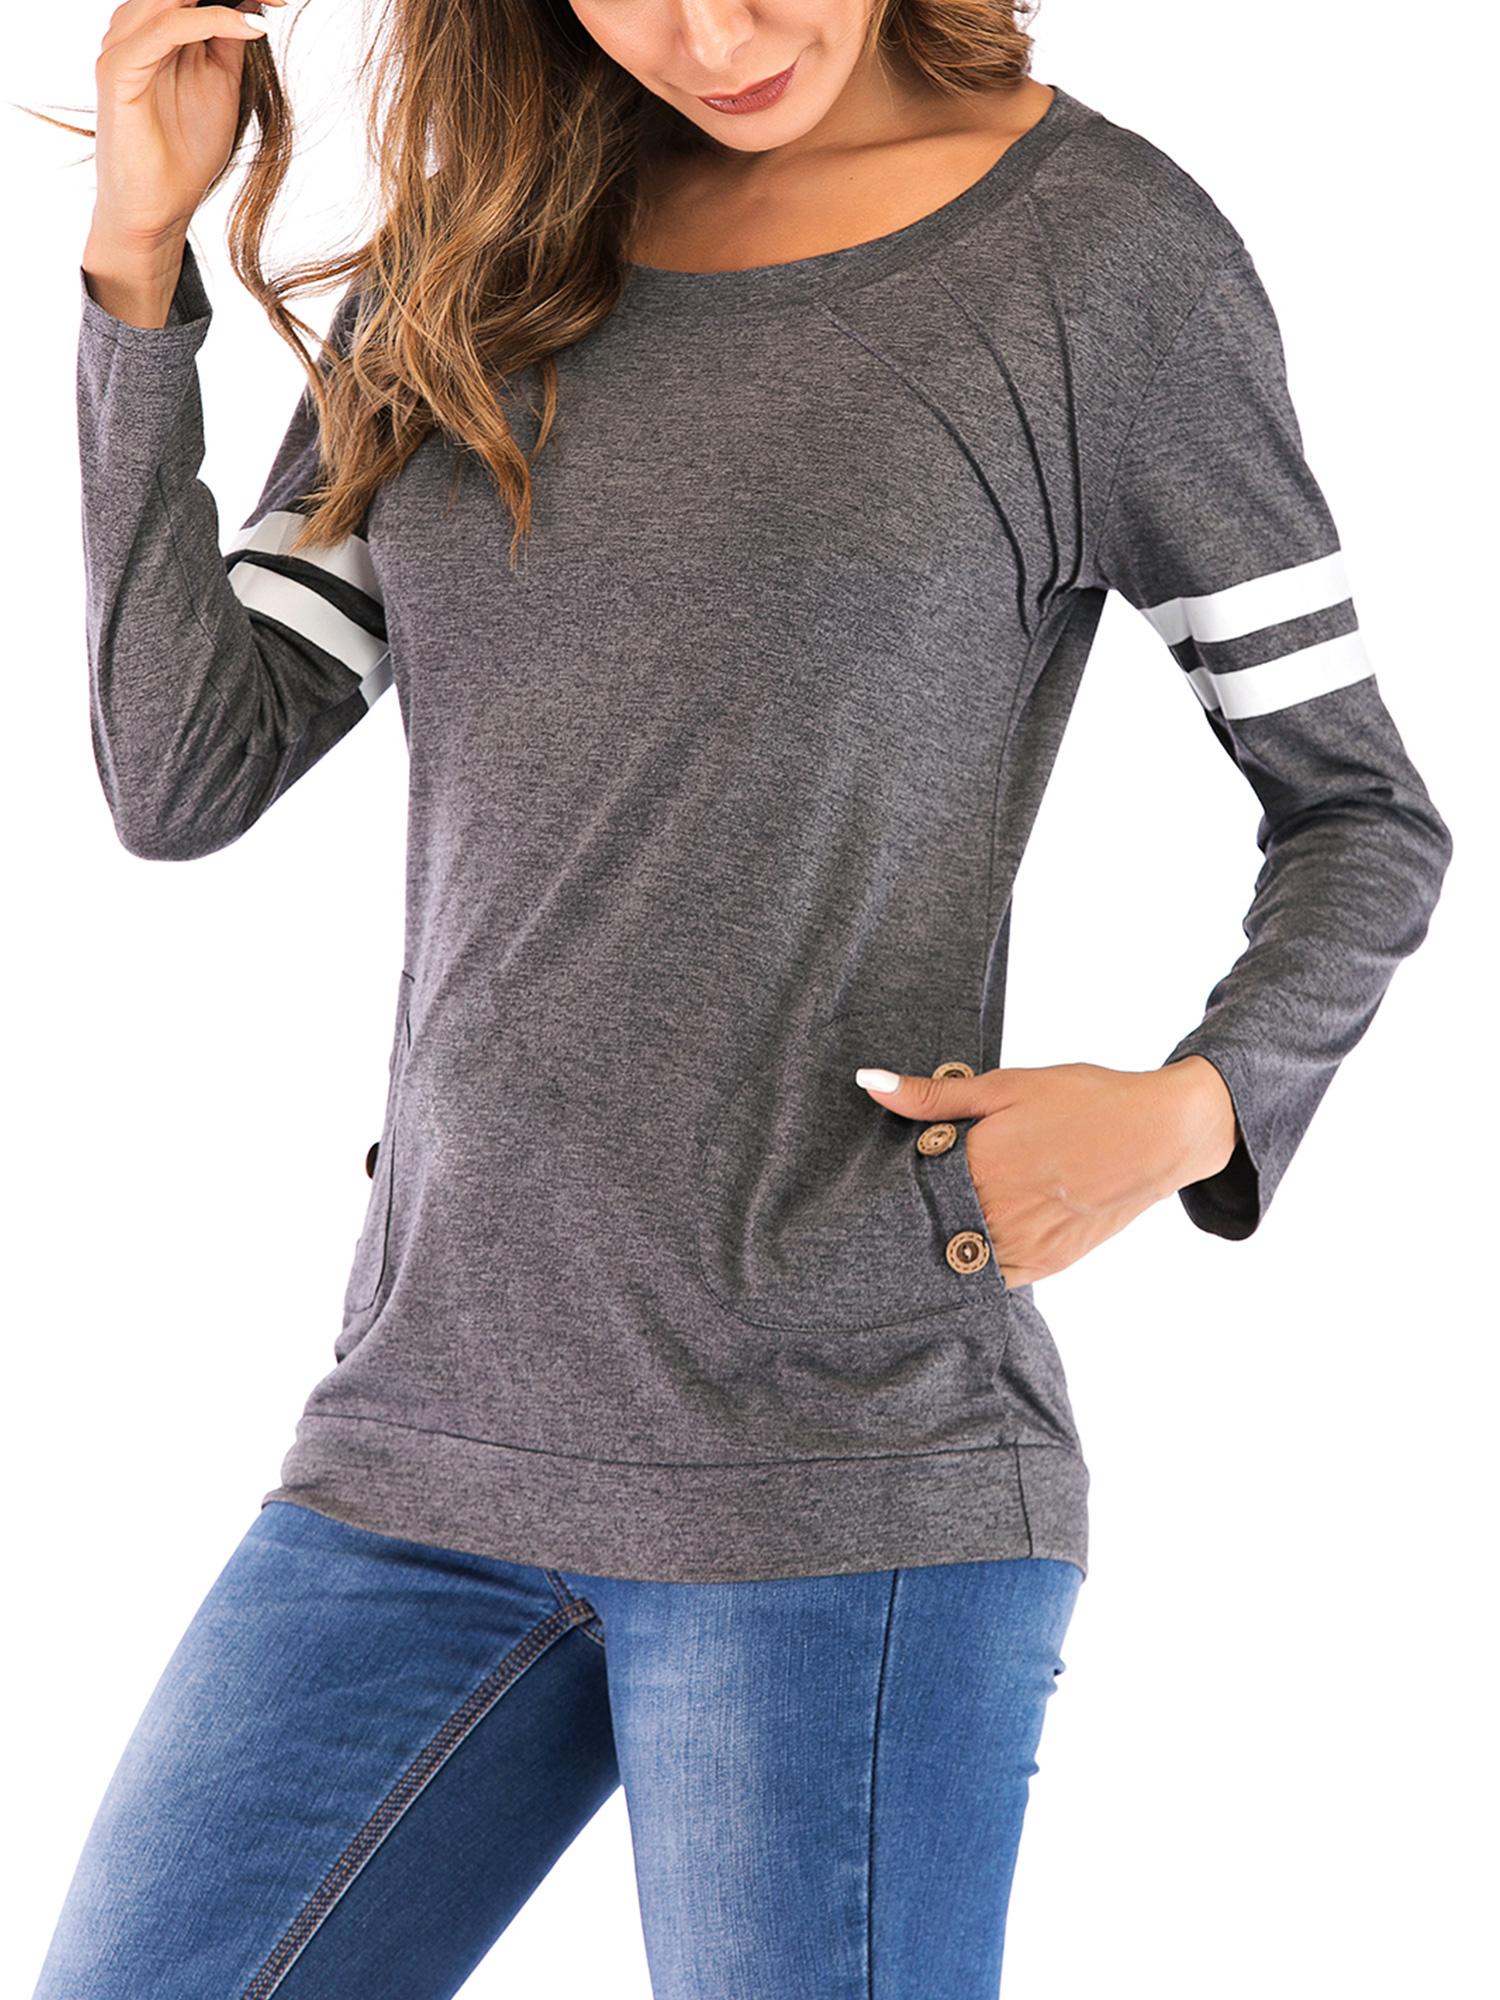 7fcbf253 SAYFUT - SAYFUT Womens Plus Size Striped Shirt Round Neck Long Sleeve  Patchwork Loose T-Shirt Casual Blouse Tops S-3XL - Walmart.com